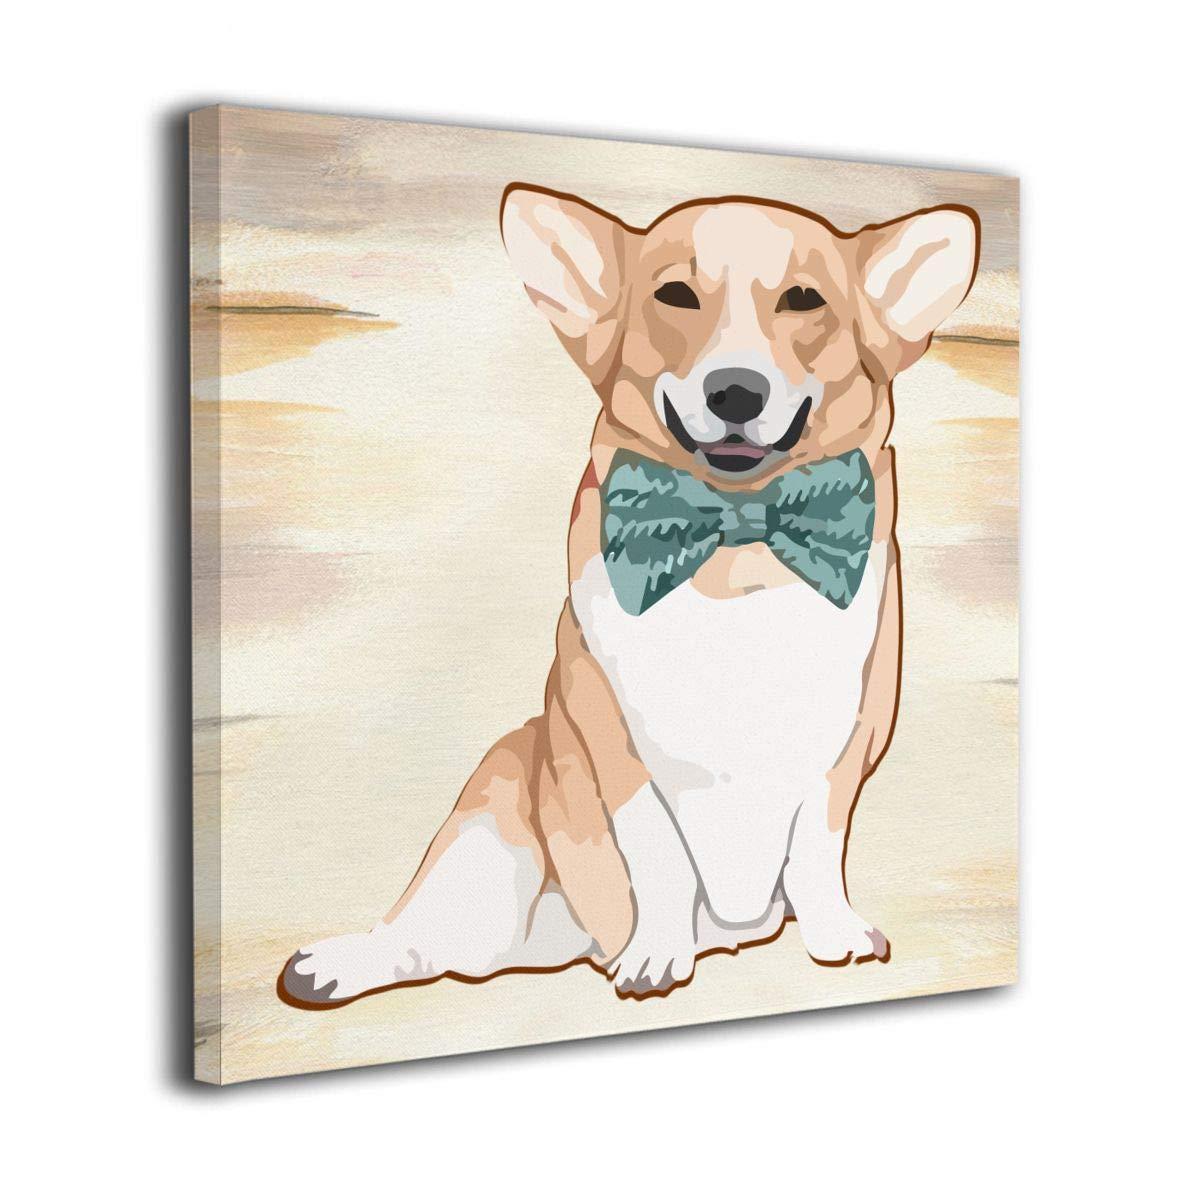 Hobson Reginald - Corbata de Lazo para Perro, Moderna, para Pintar ...